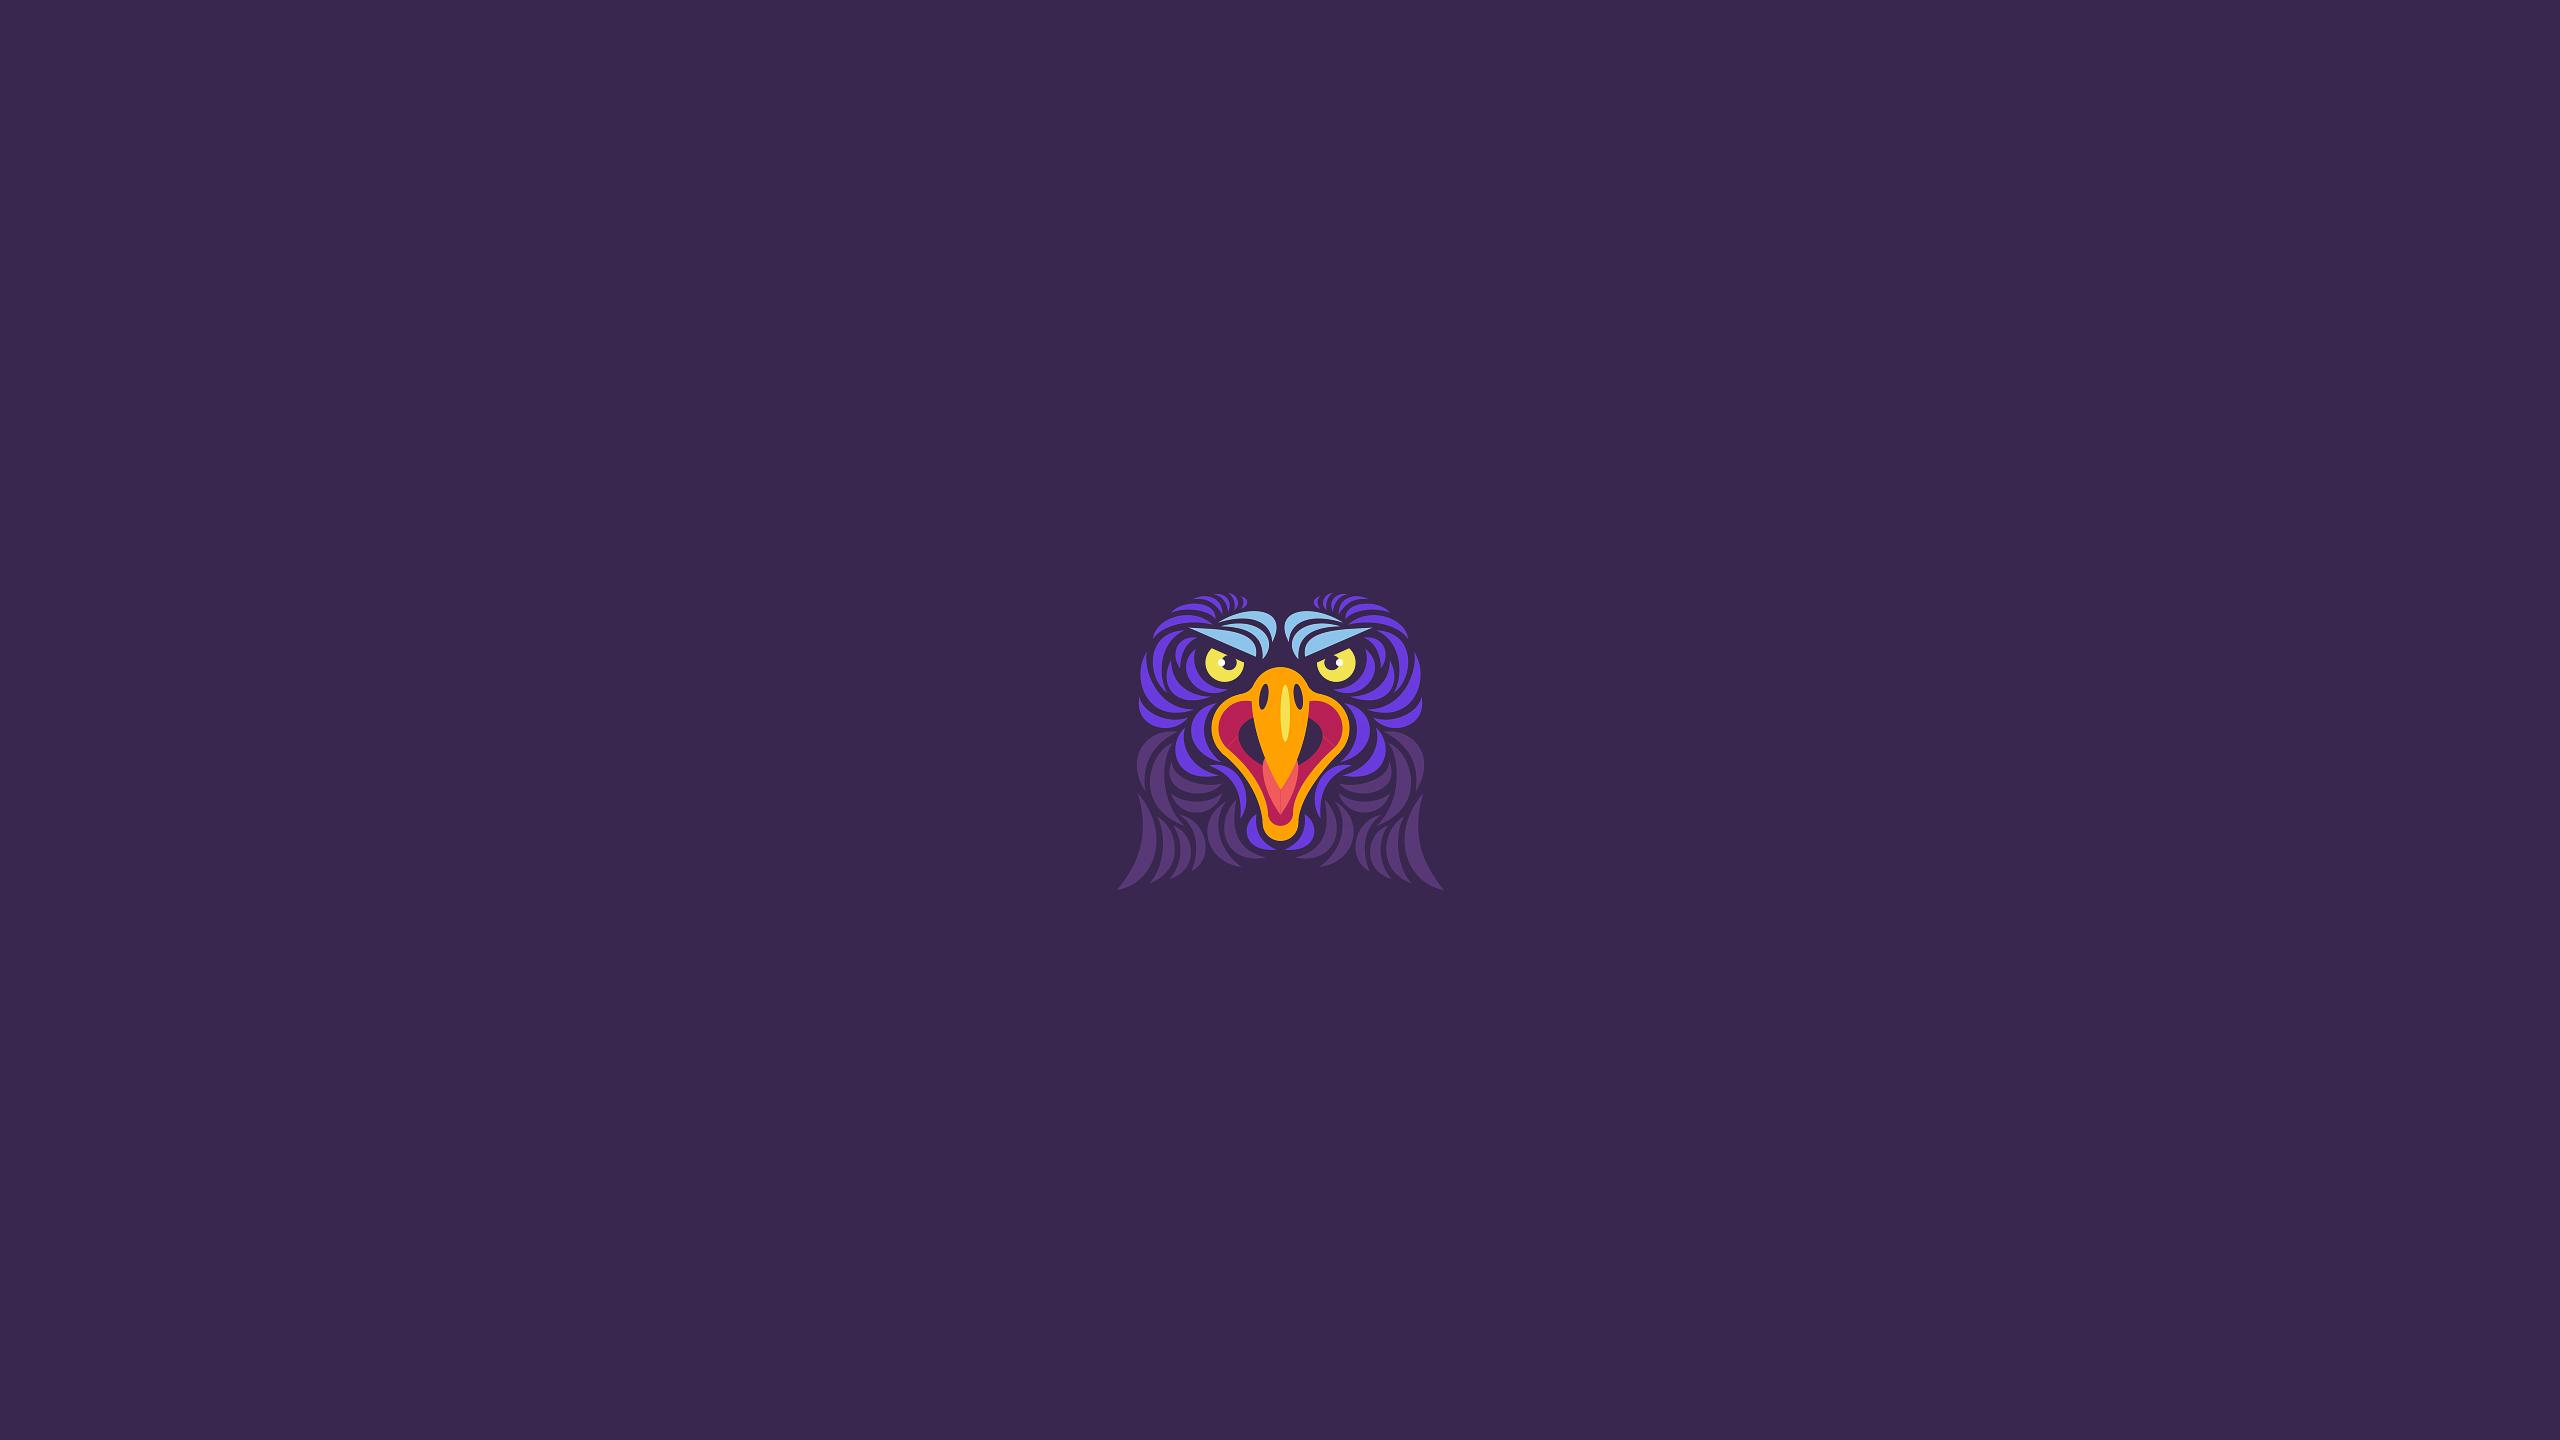 General 2560x1440 graphic design eagle bald eagle animals